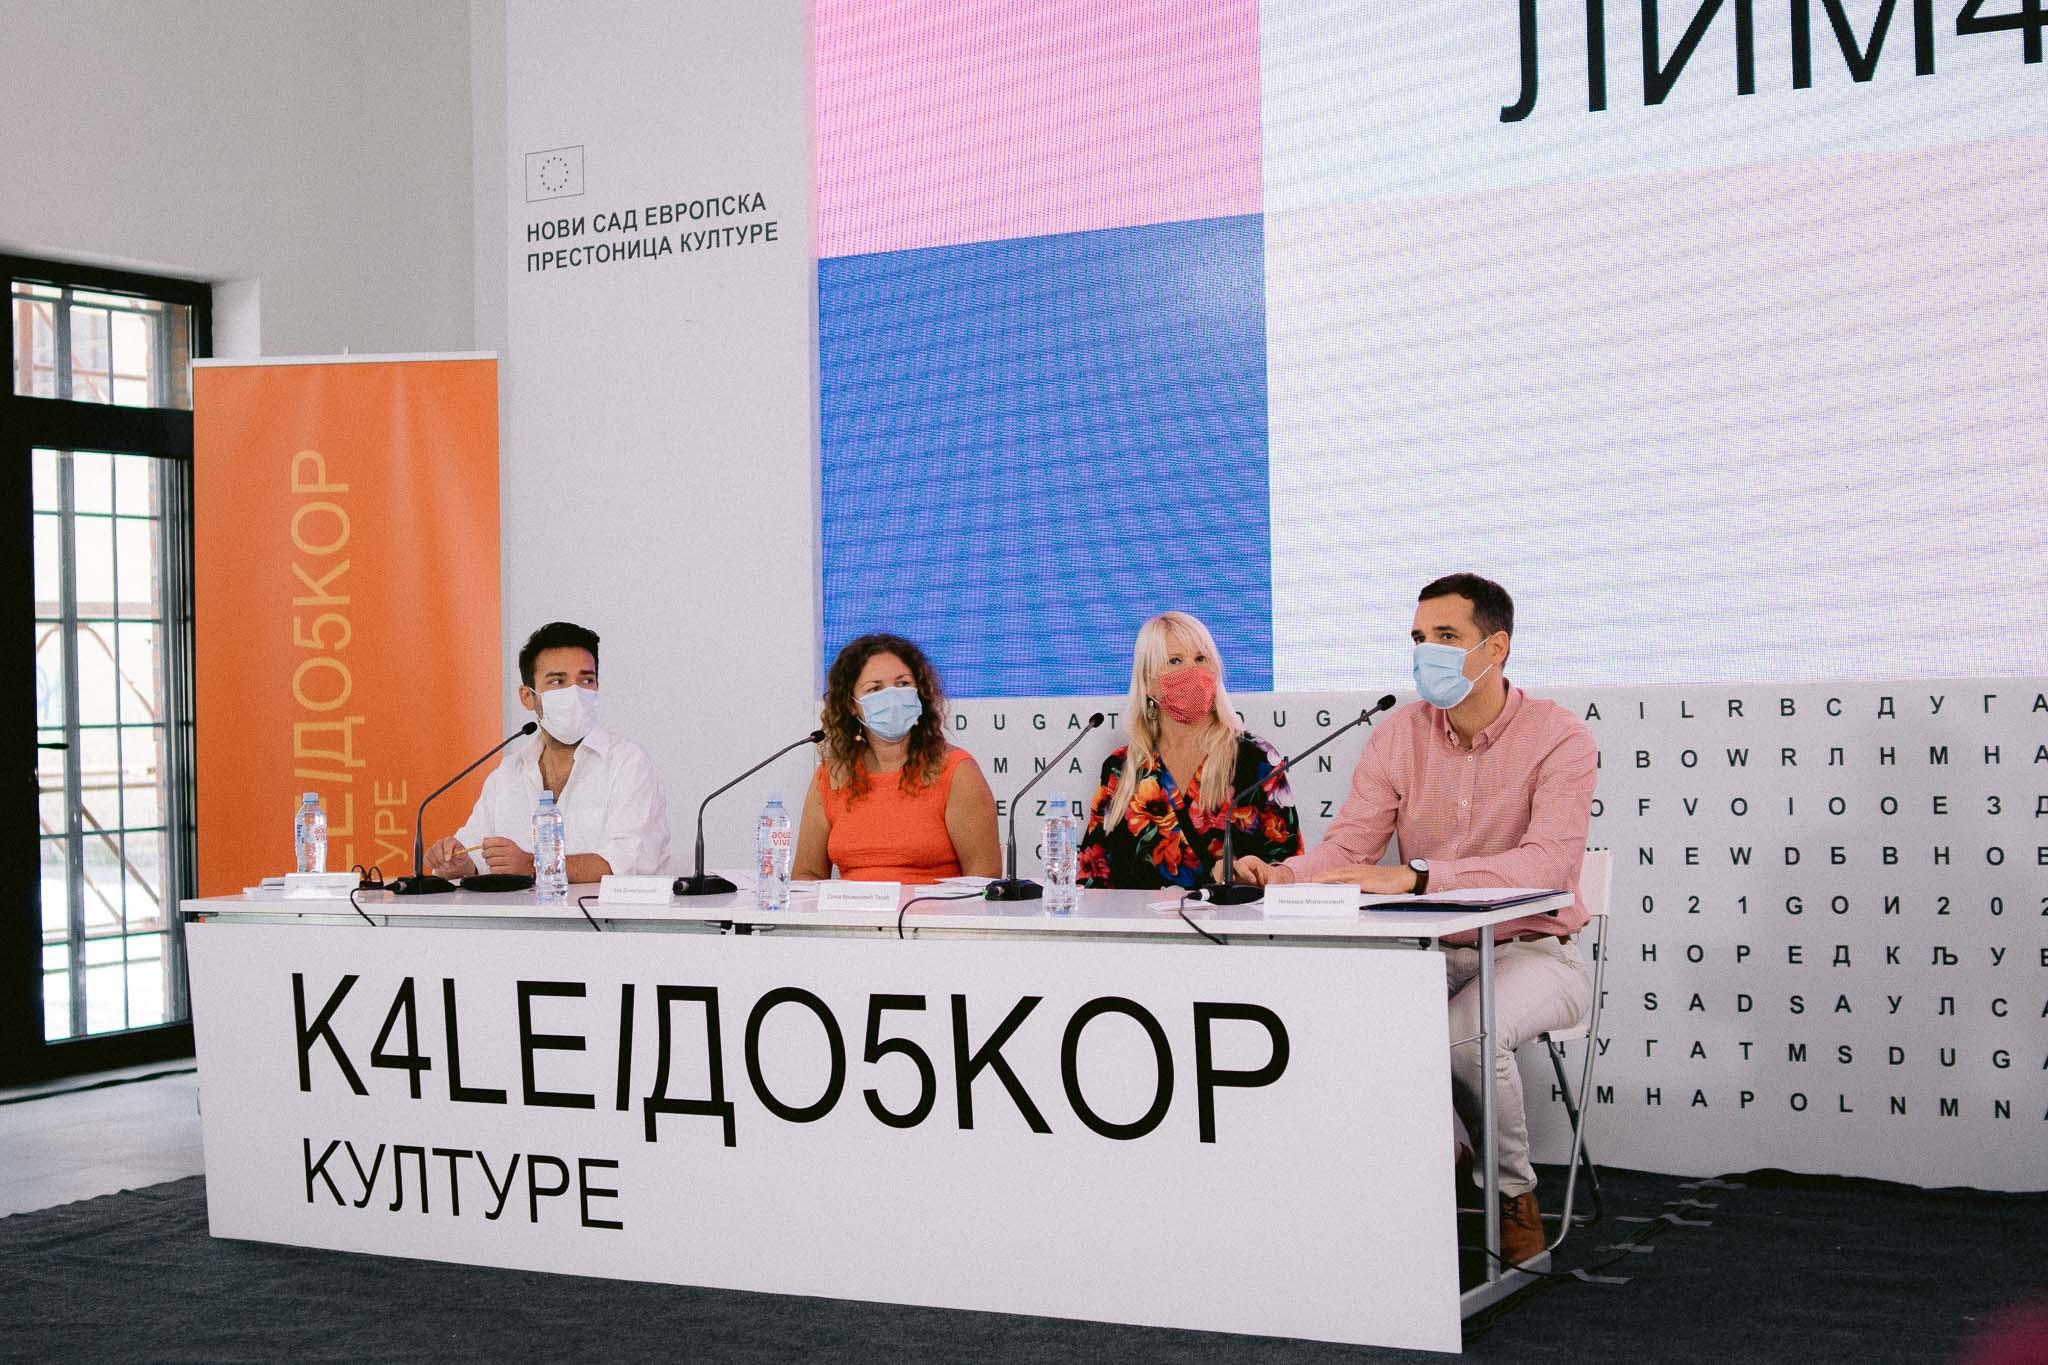 treći kaleidoskop kulture konferencija